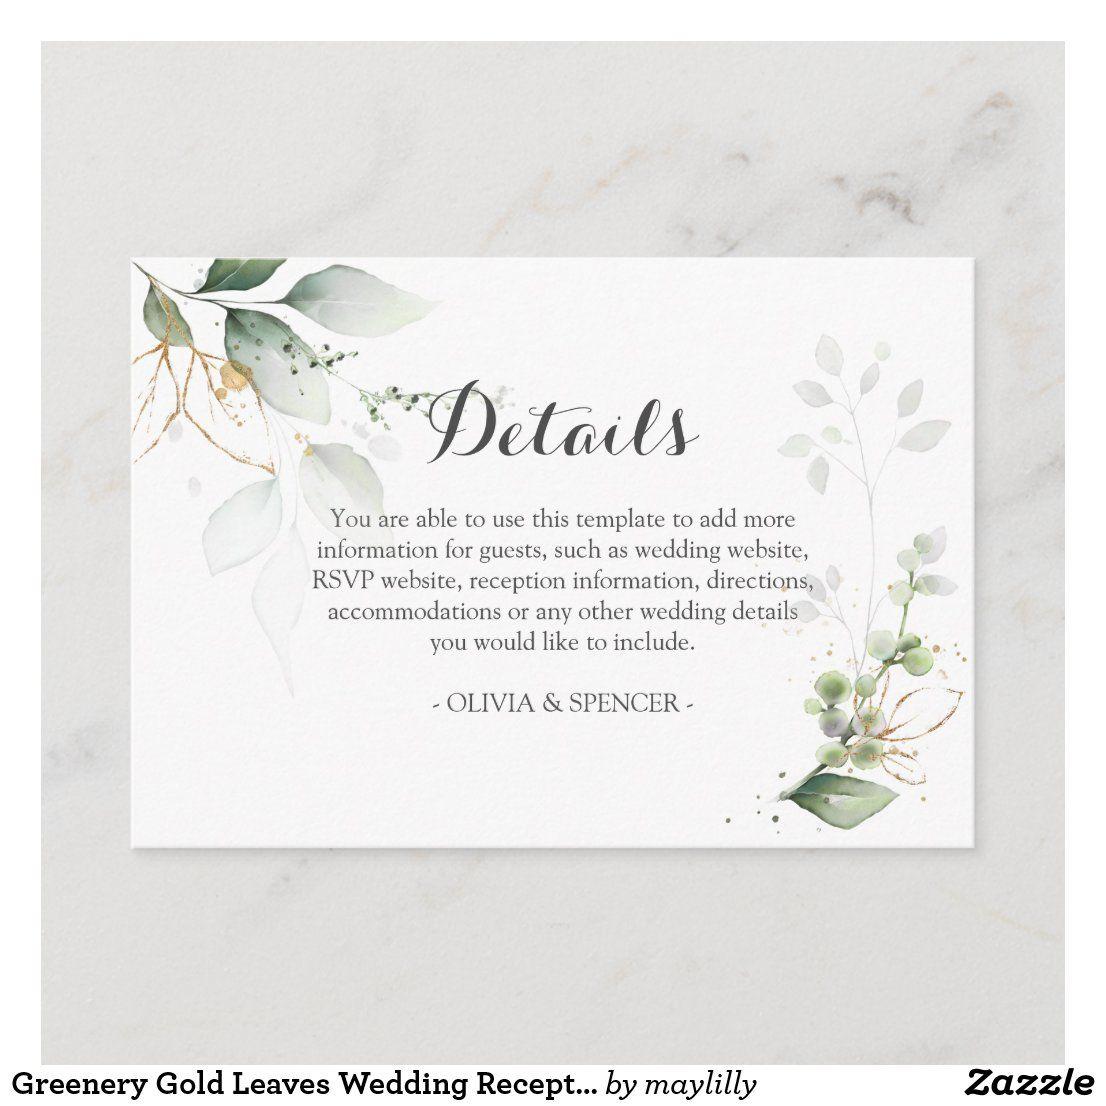 Greenery Gold Leaves Wedding Reception Details Enclosure